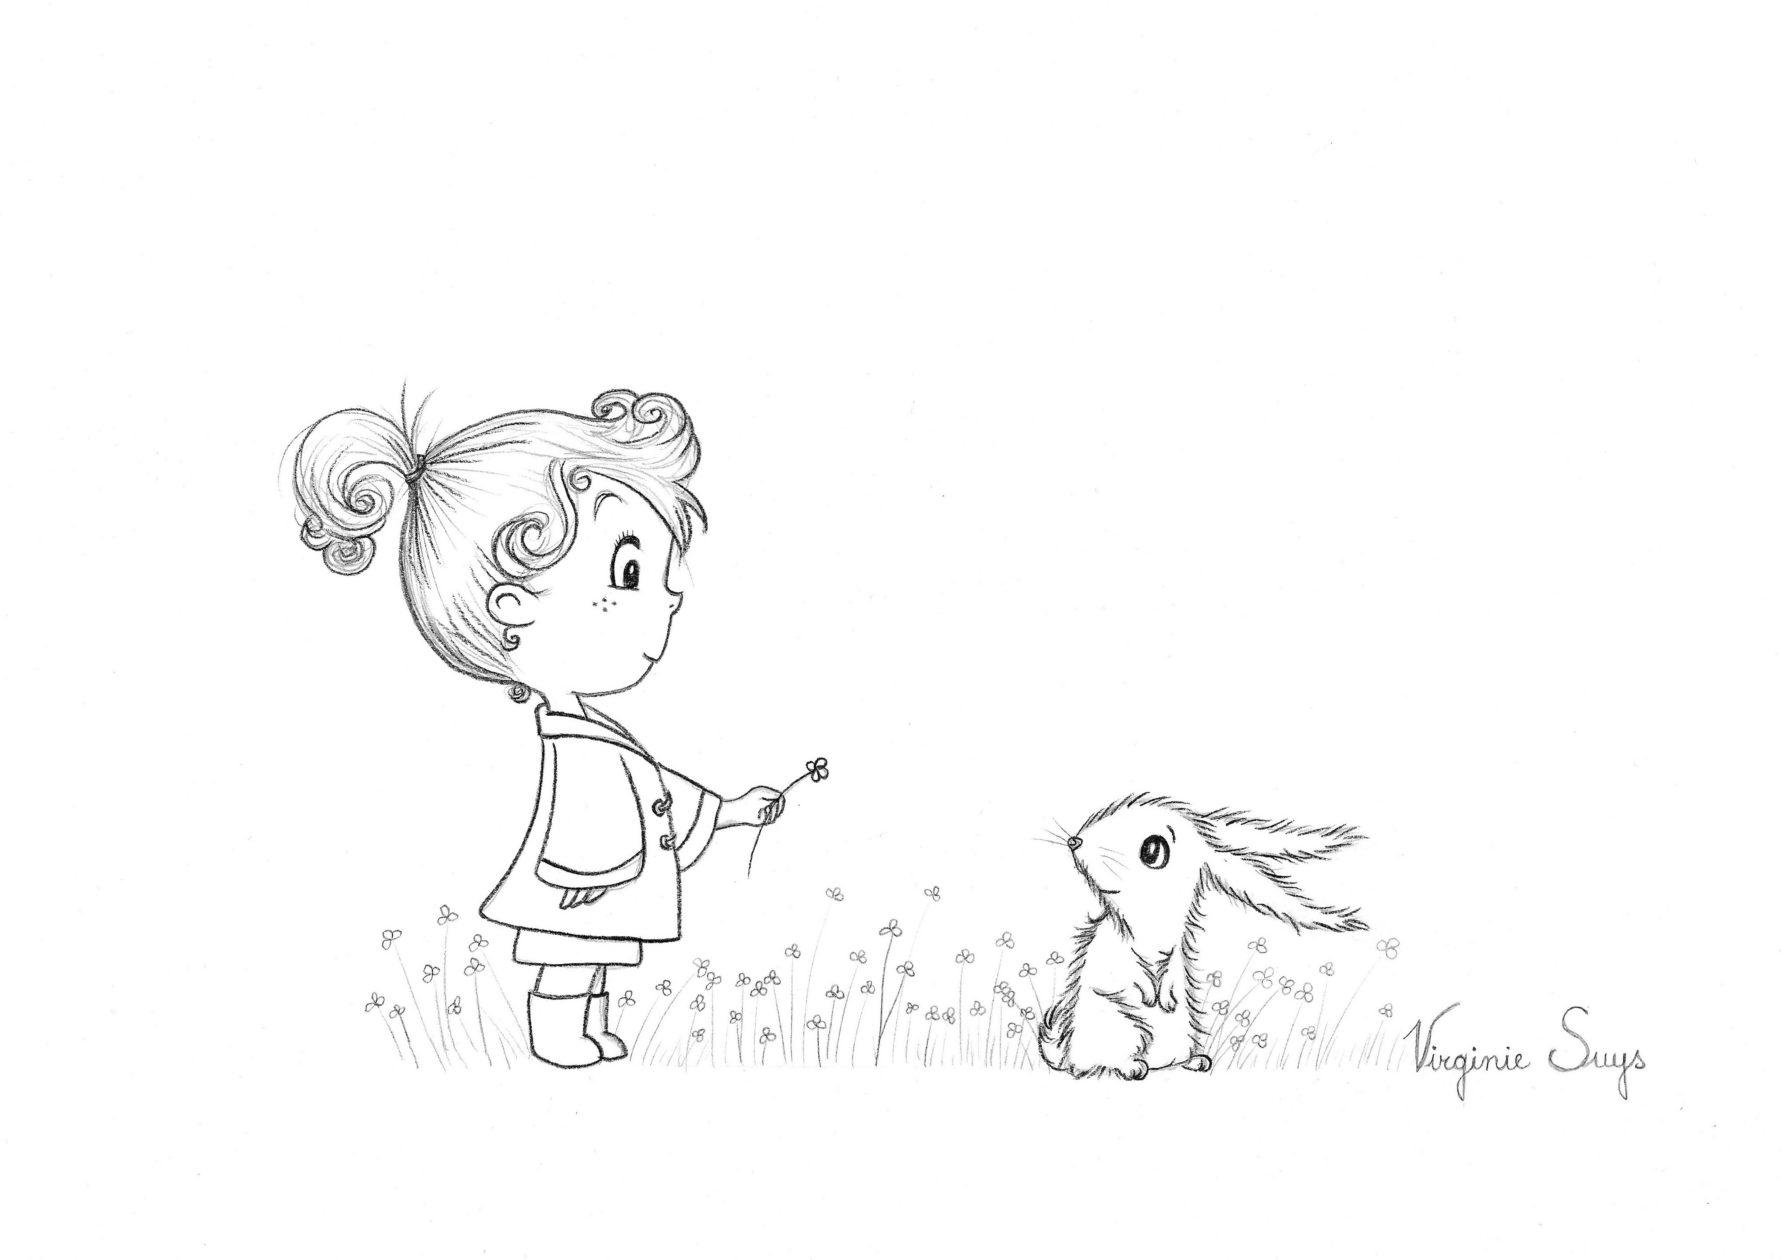 Virginie Suys Girl with rabbit in black & white illustration